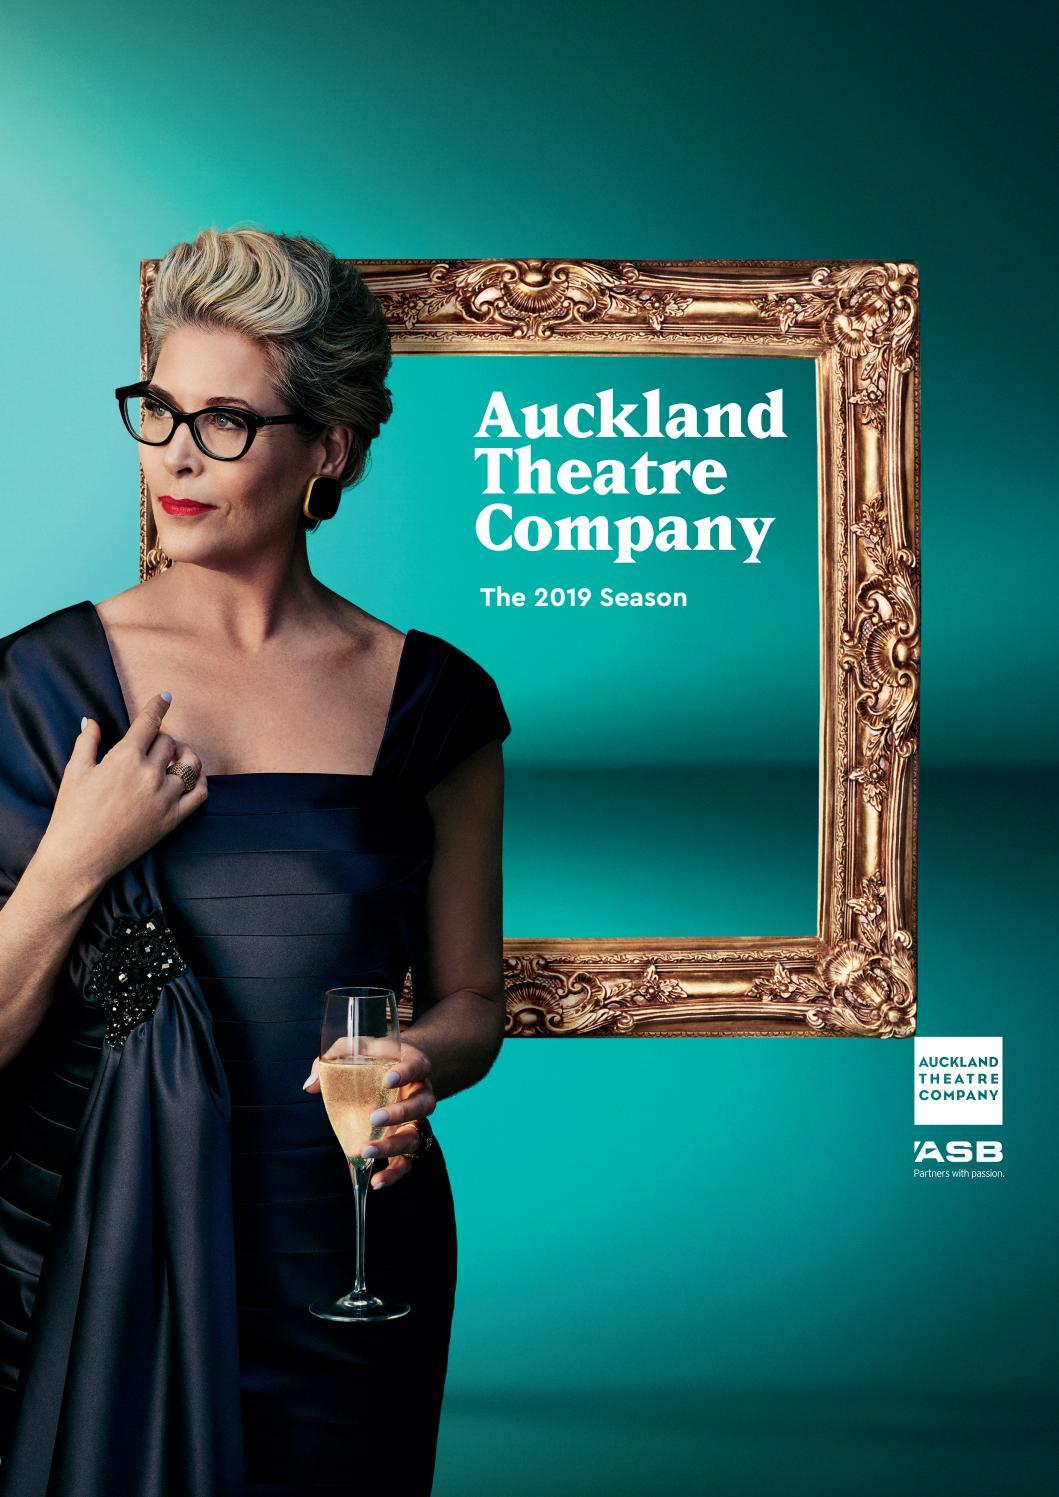 Auckland Theatre Company 2019 season brochure by Auckland Theatre